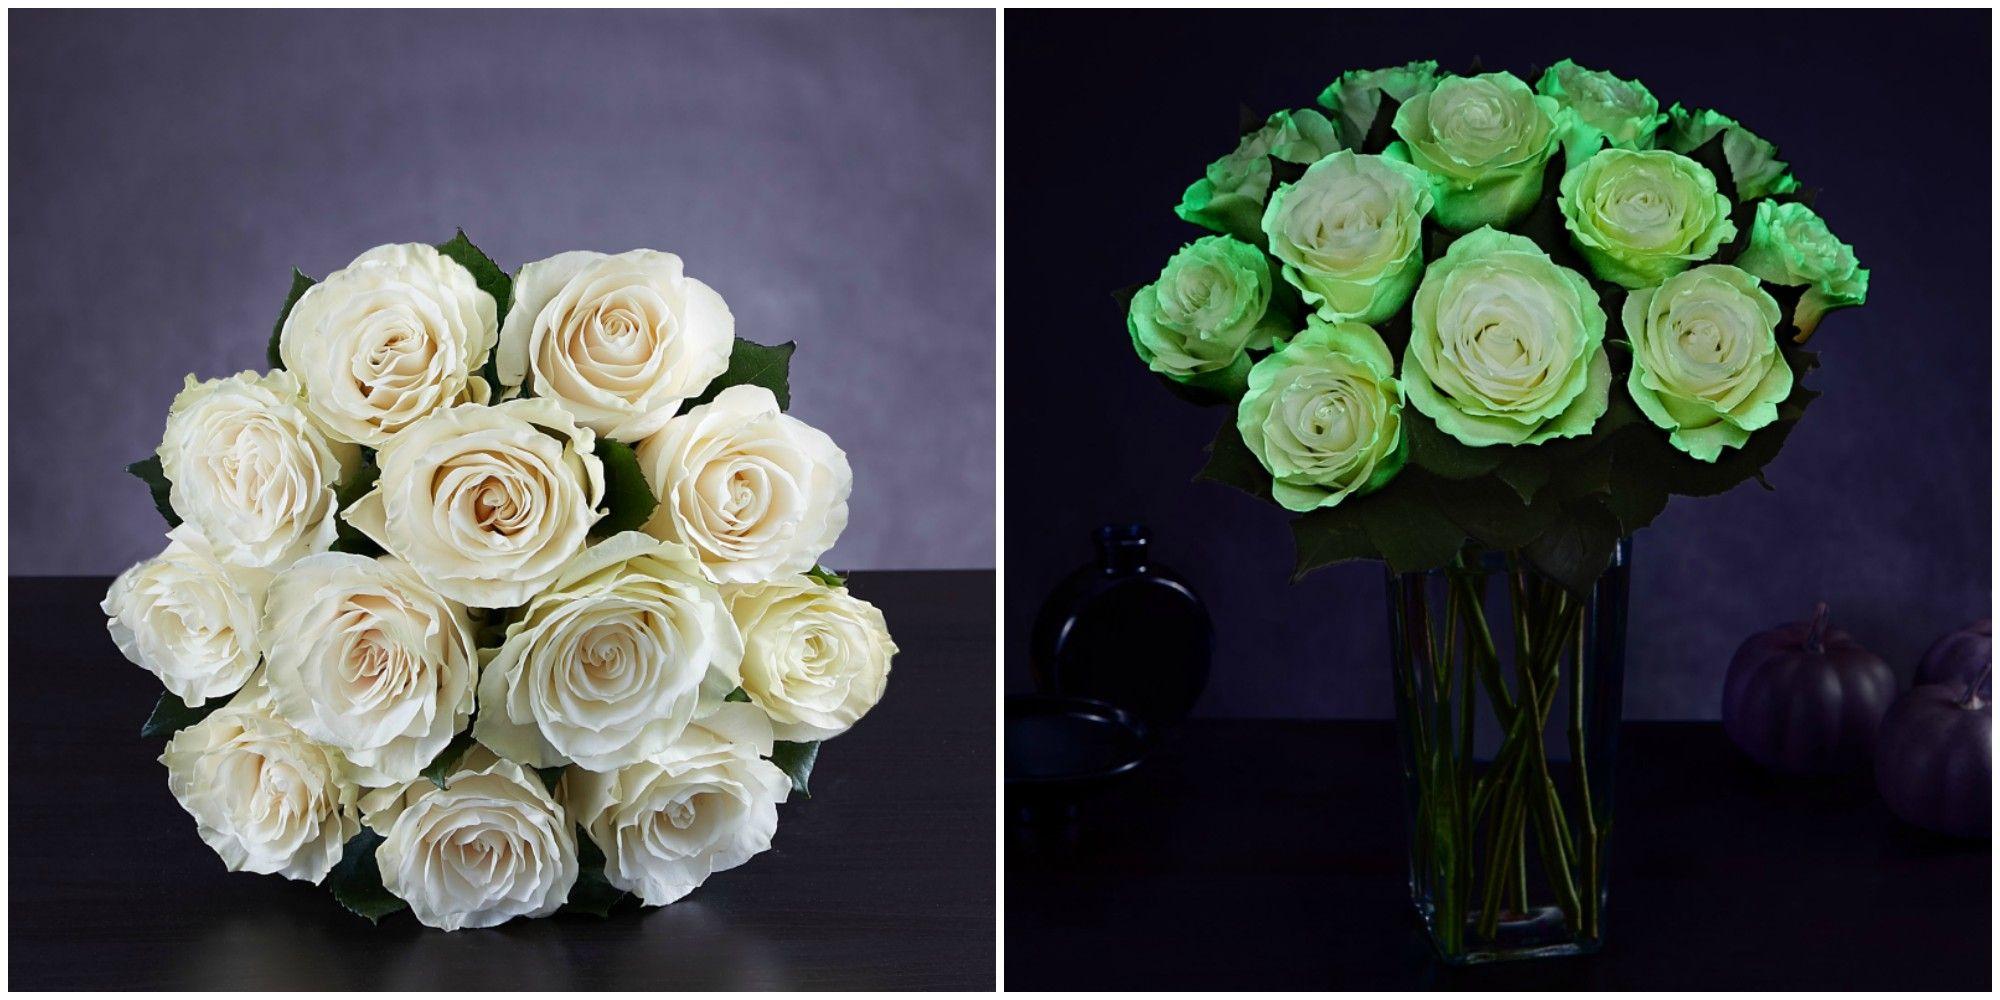 Spooky glow in the dark roses now exist halloween flowers izmirmasajfo Choice Image